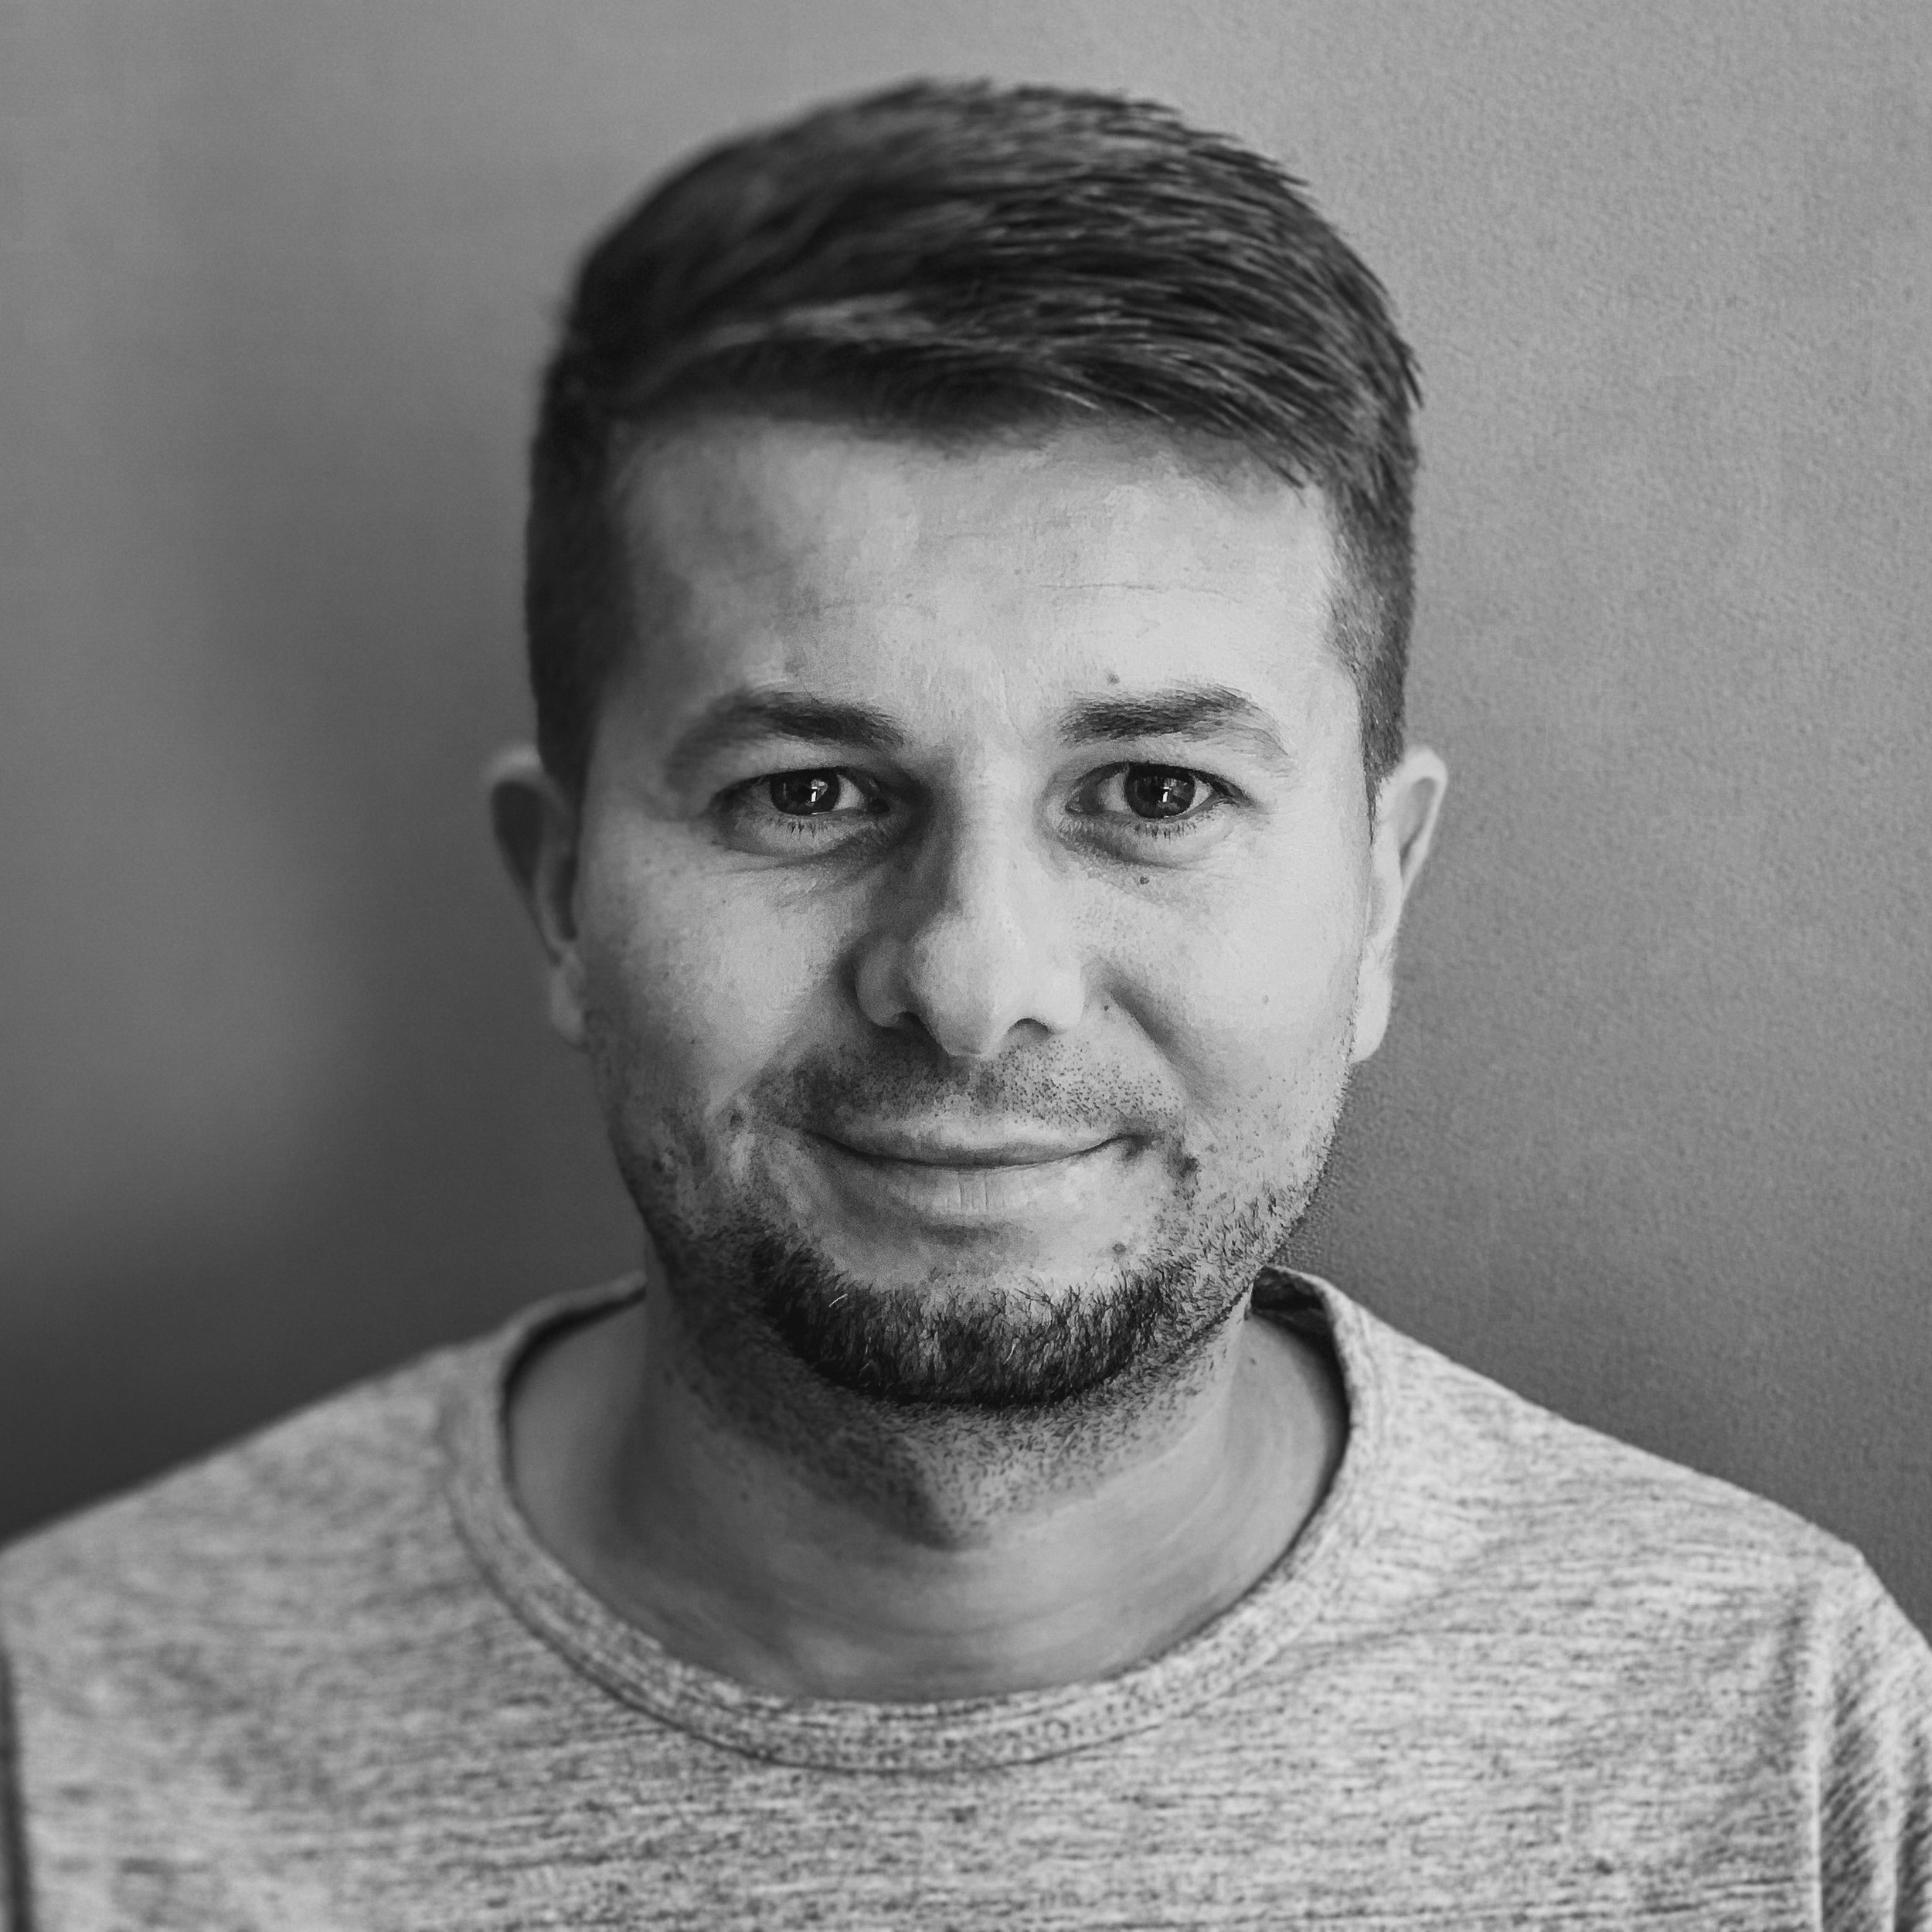 Almir Selimovic  Drafting technician  almir@ark-amb.no   +47 459 79 834